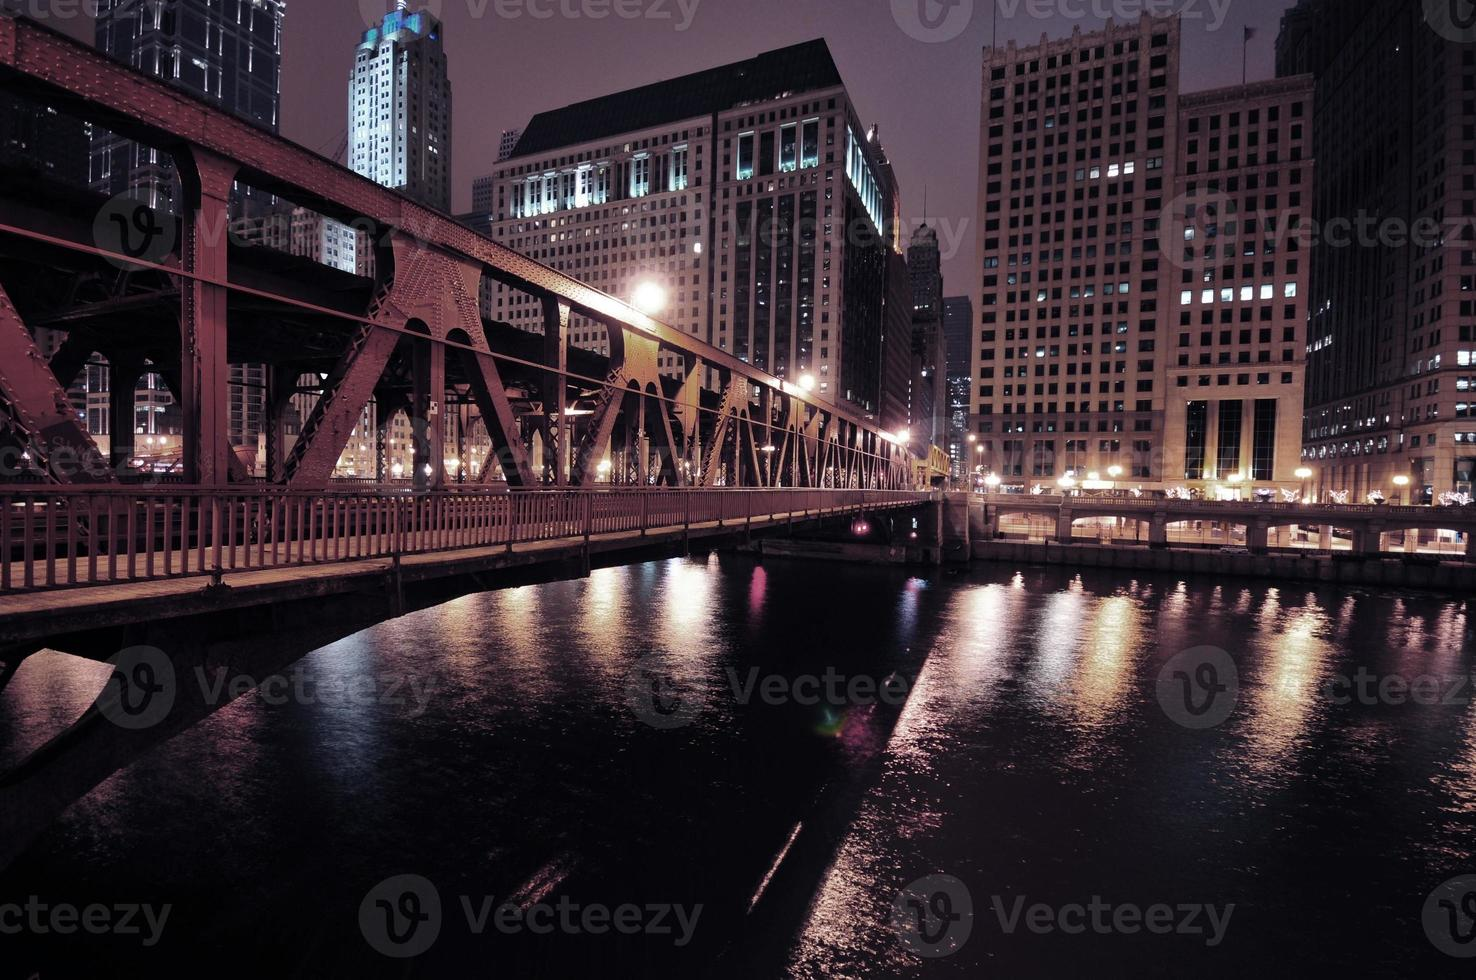 Chicago Riverwalk photo